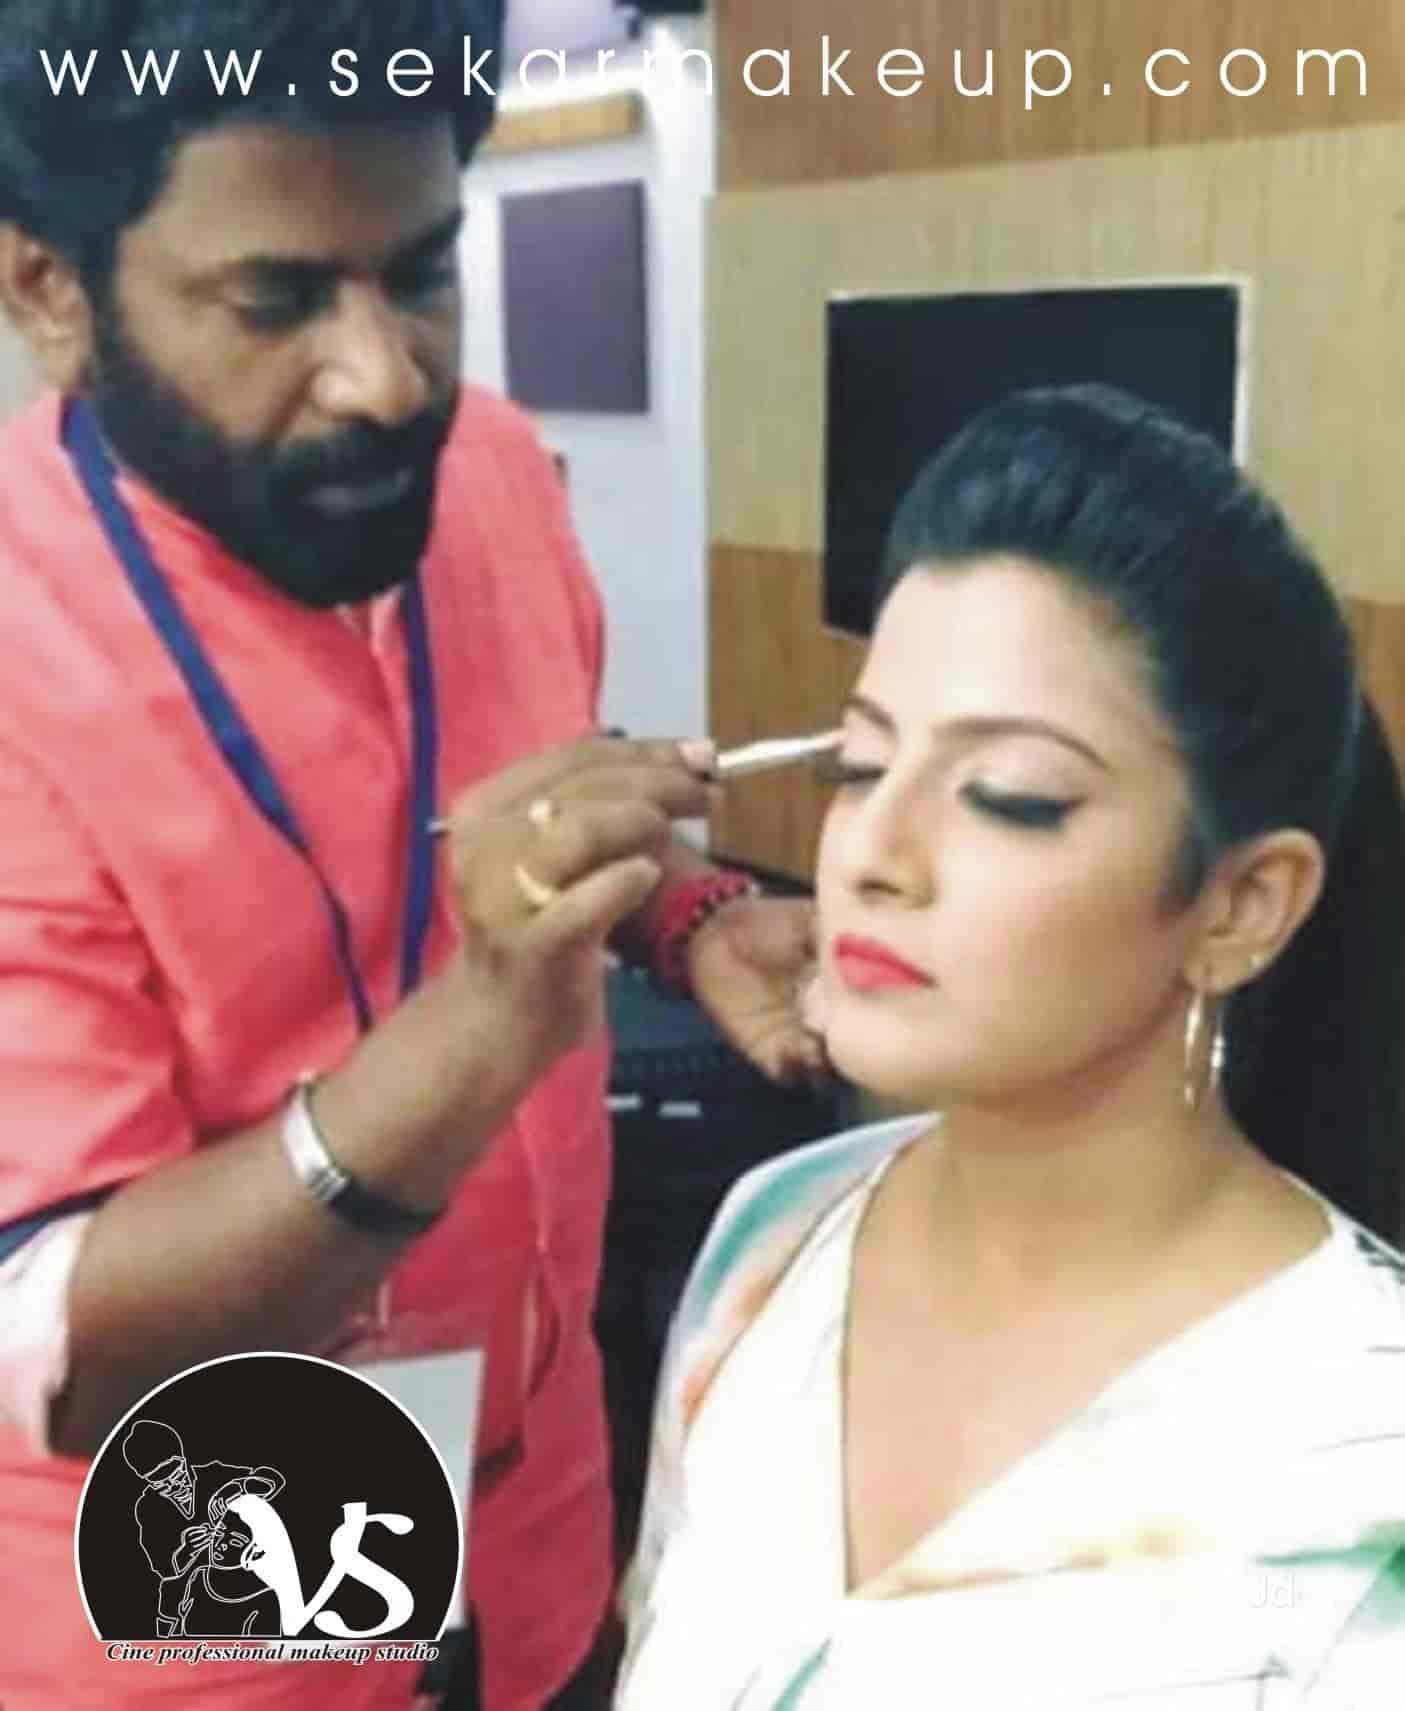 ... chennai veera sekar cine professional makeup studio k k nagar vira sekar cine professional makeup studio hair ...